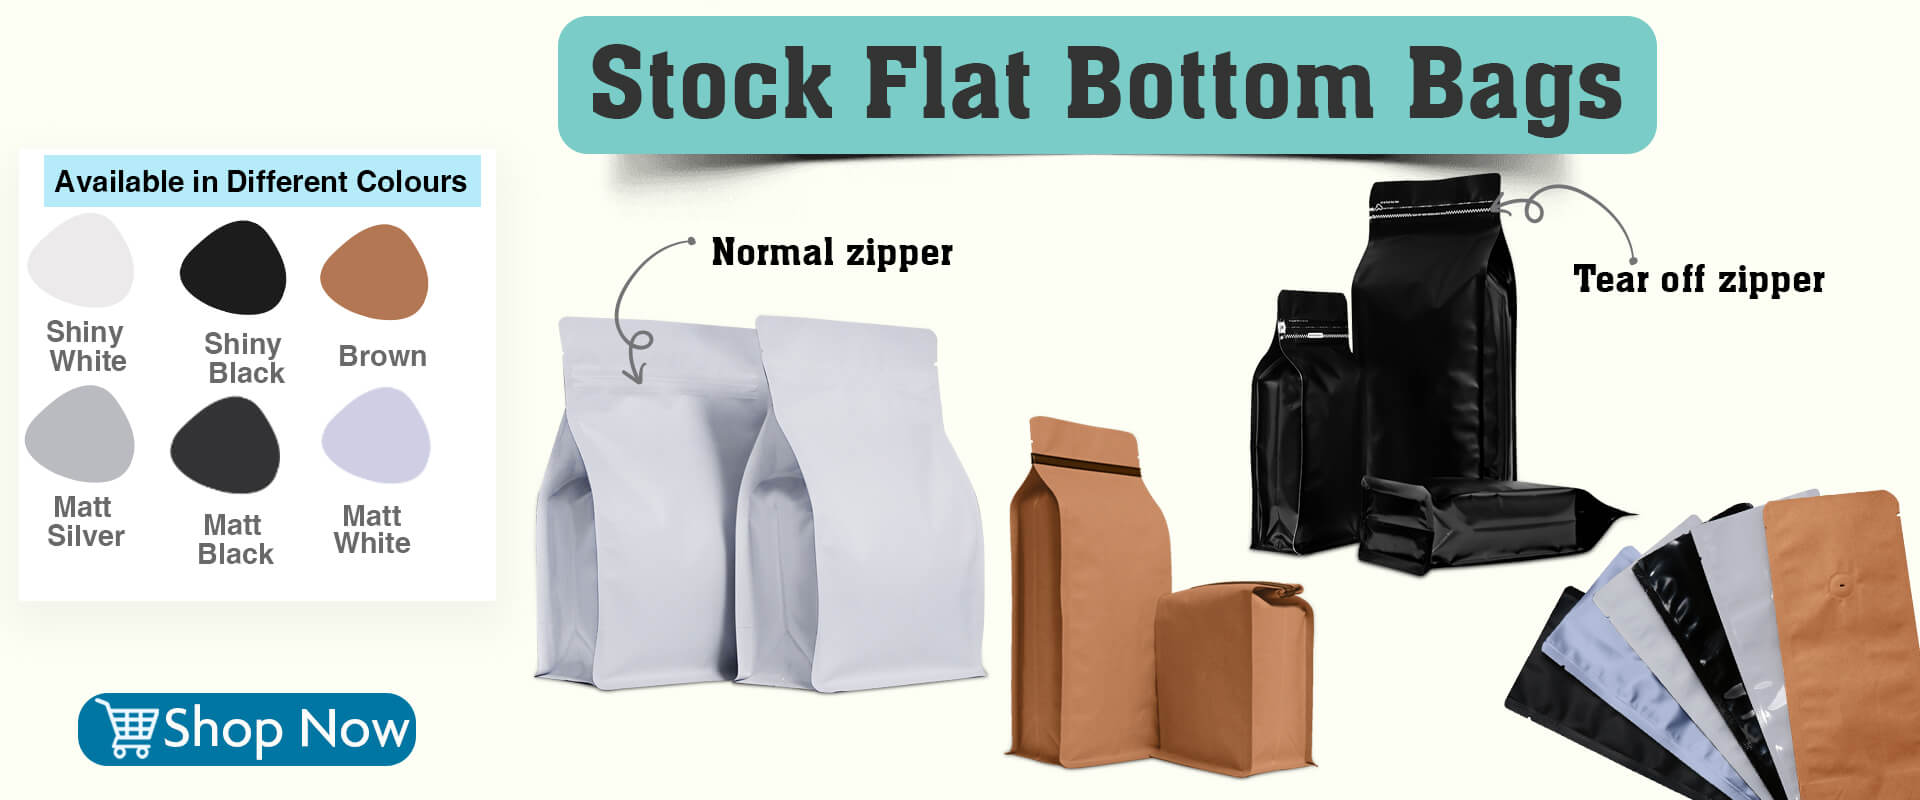 Flat bottom pouches